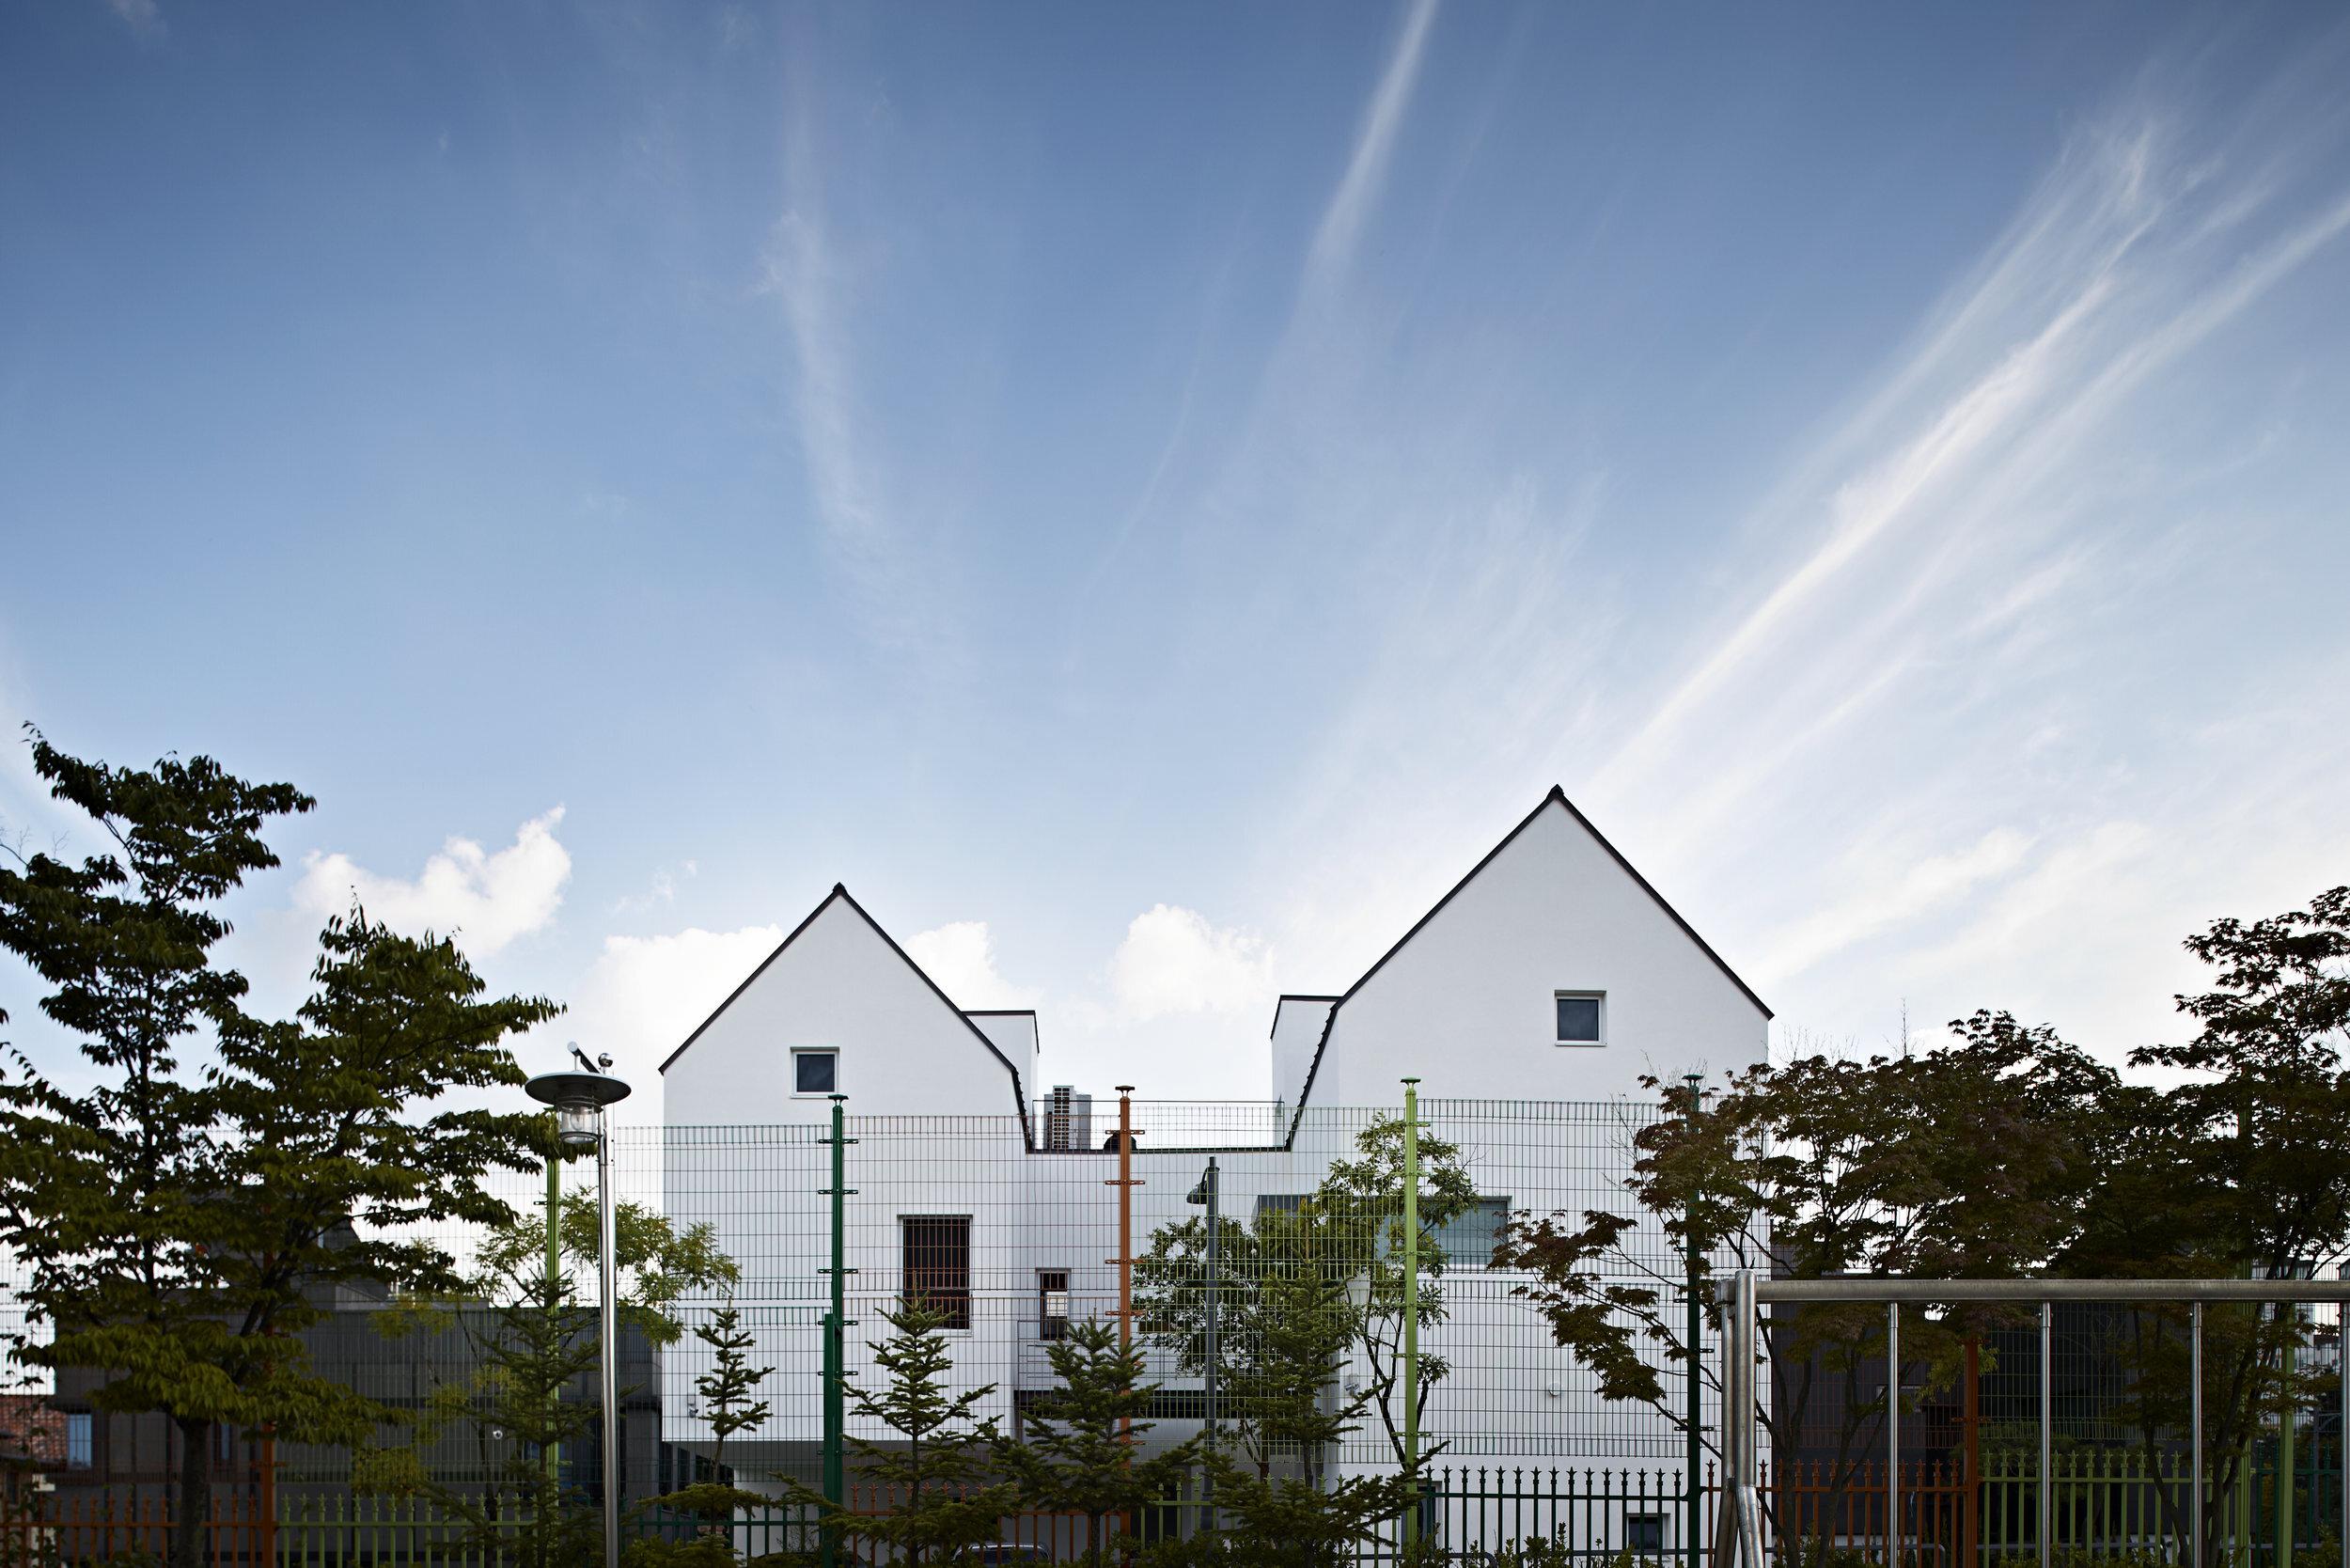 51d87adae8e44ed53800004c_house-of-uchigami-keisuke-kawaguchi-k2-design_035.jpg